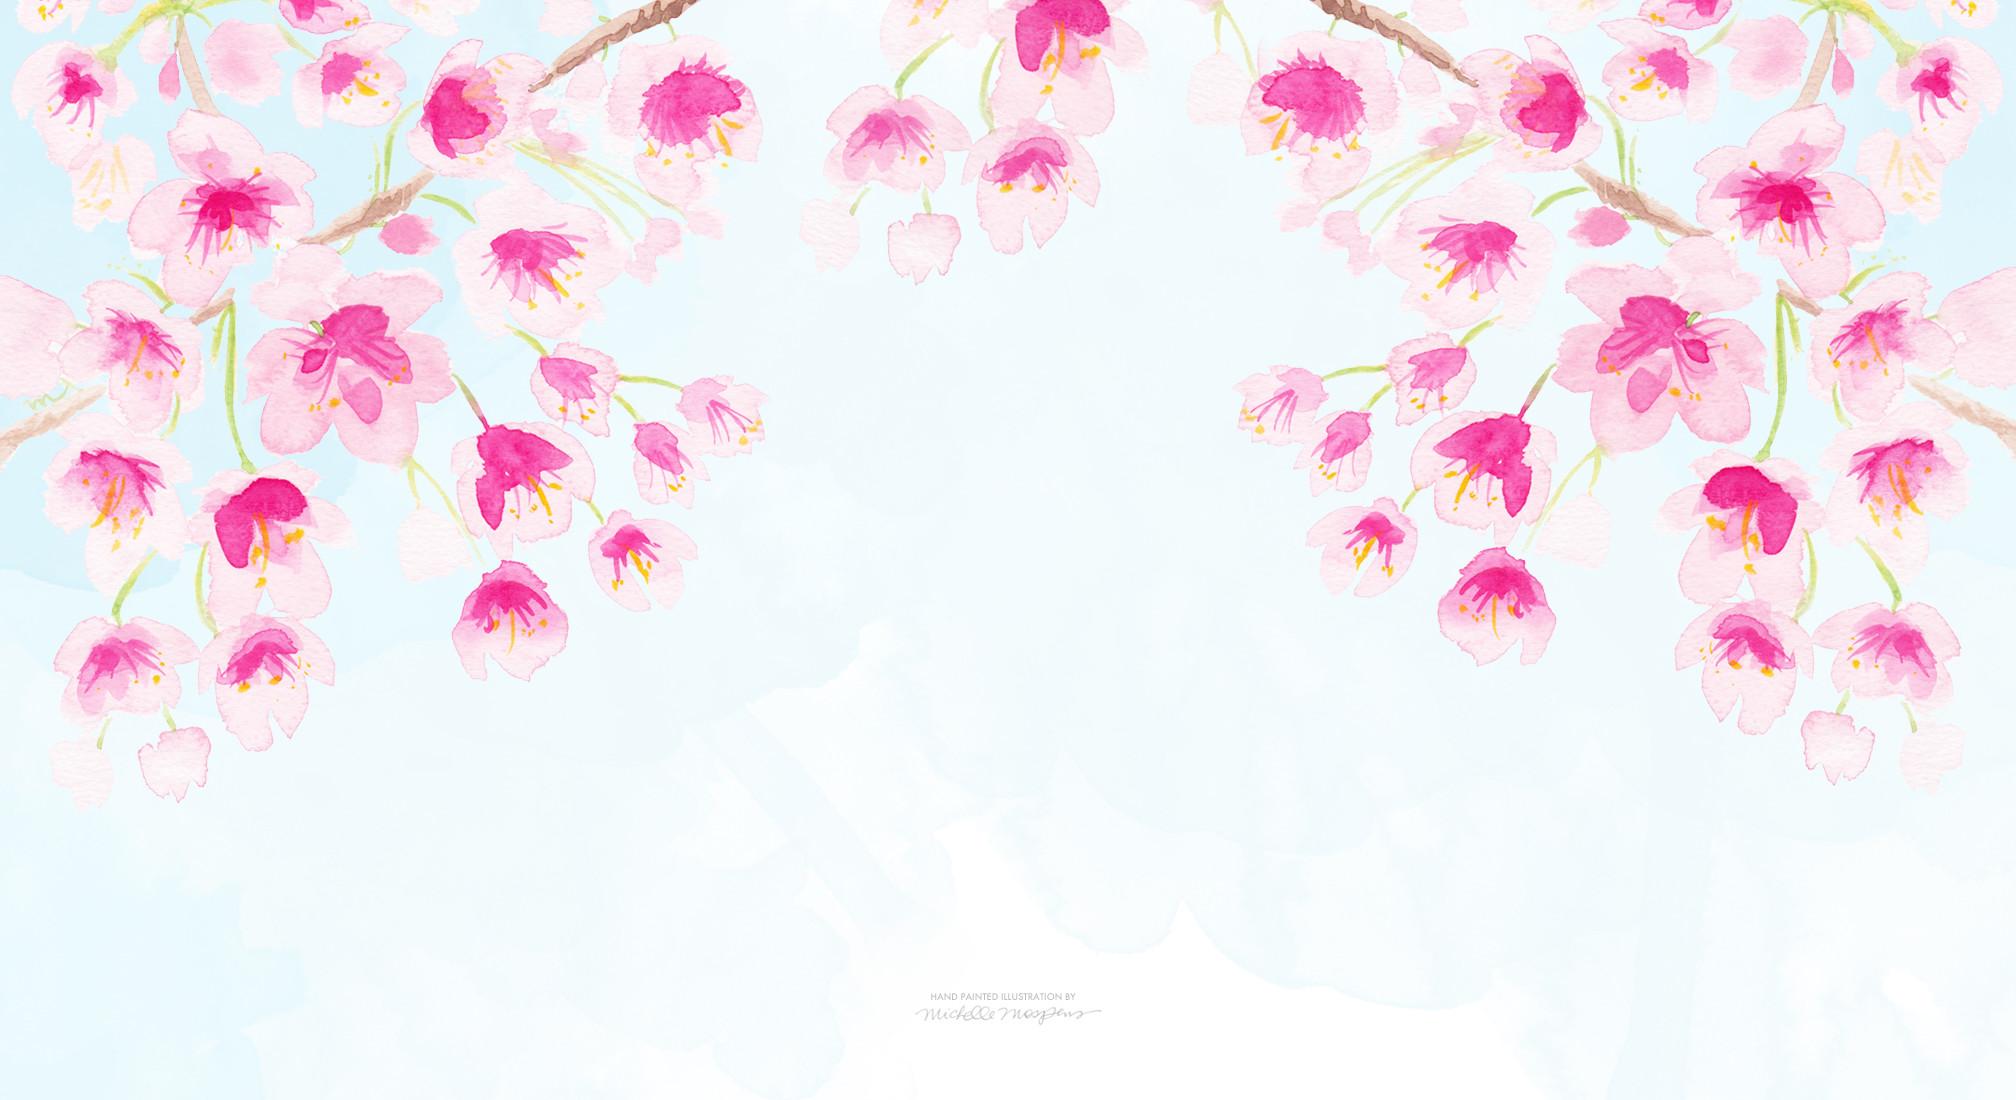 Bright Floral Wallpaper Phone